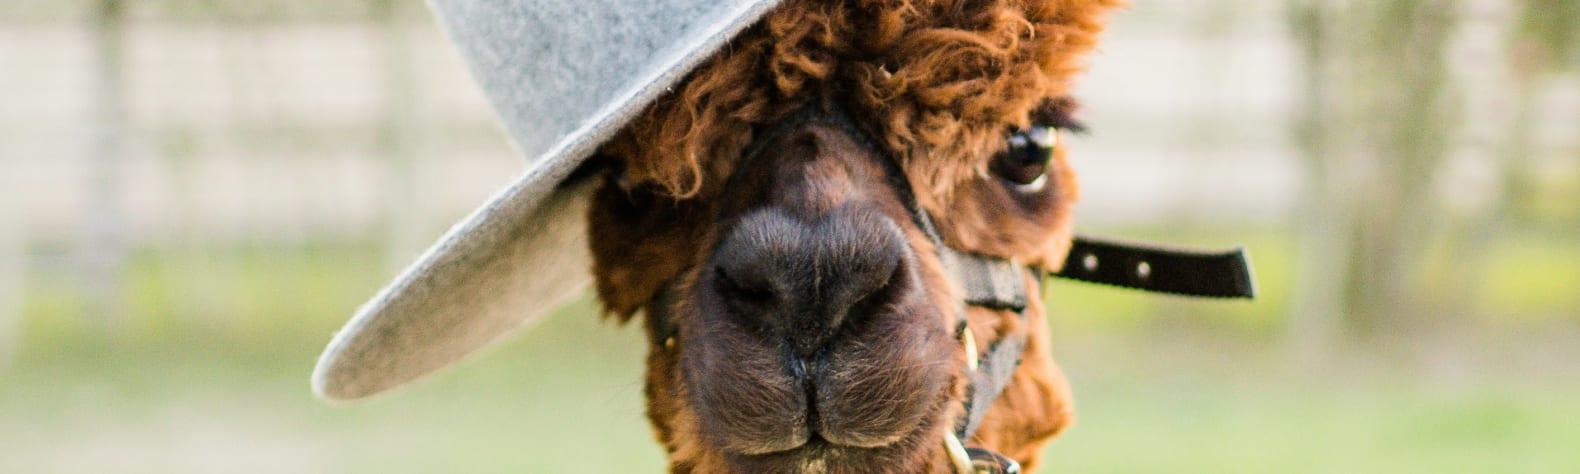 Windbreak Farm Alpacas